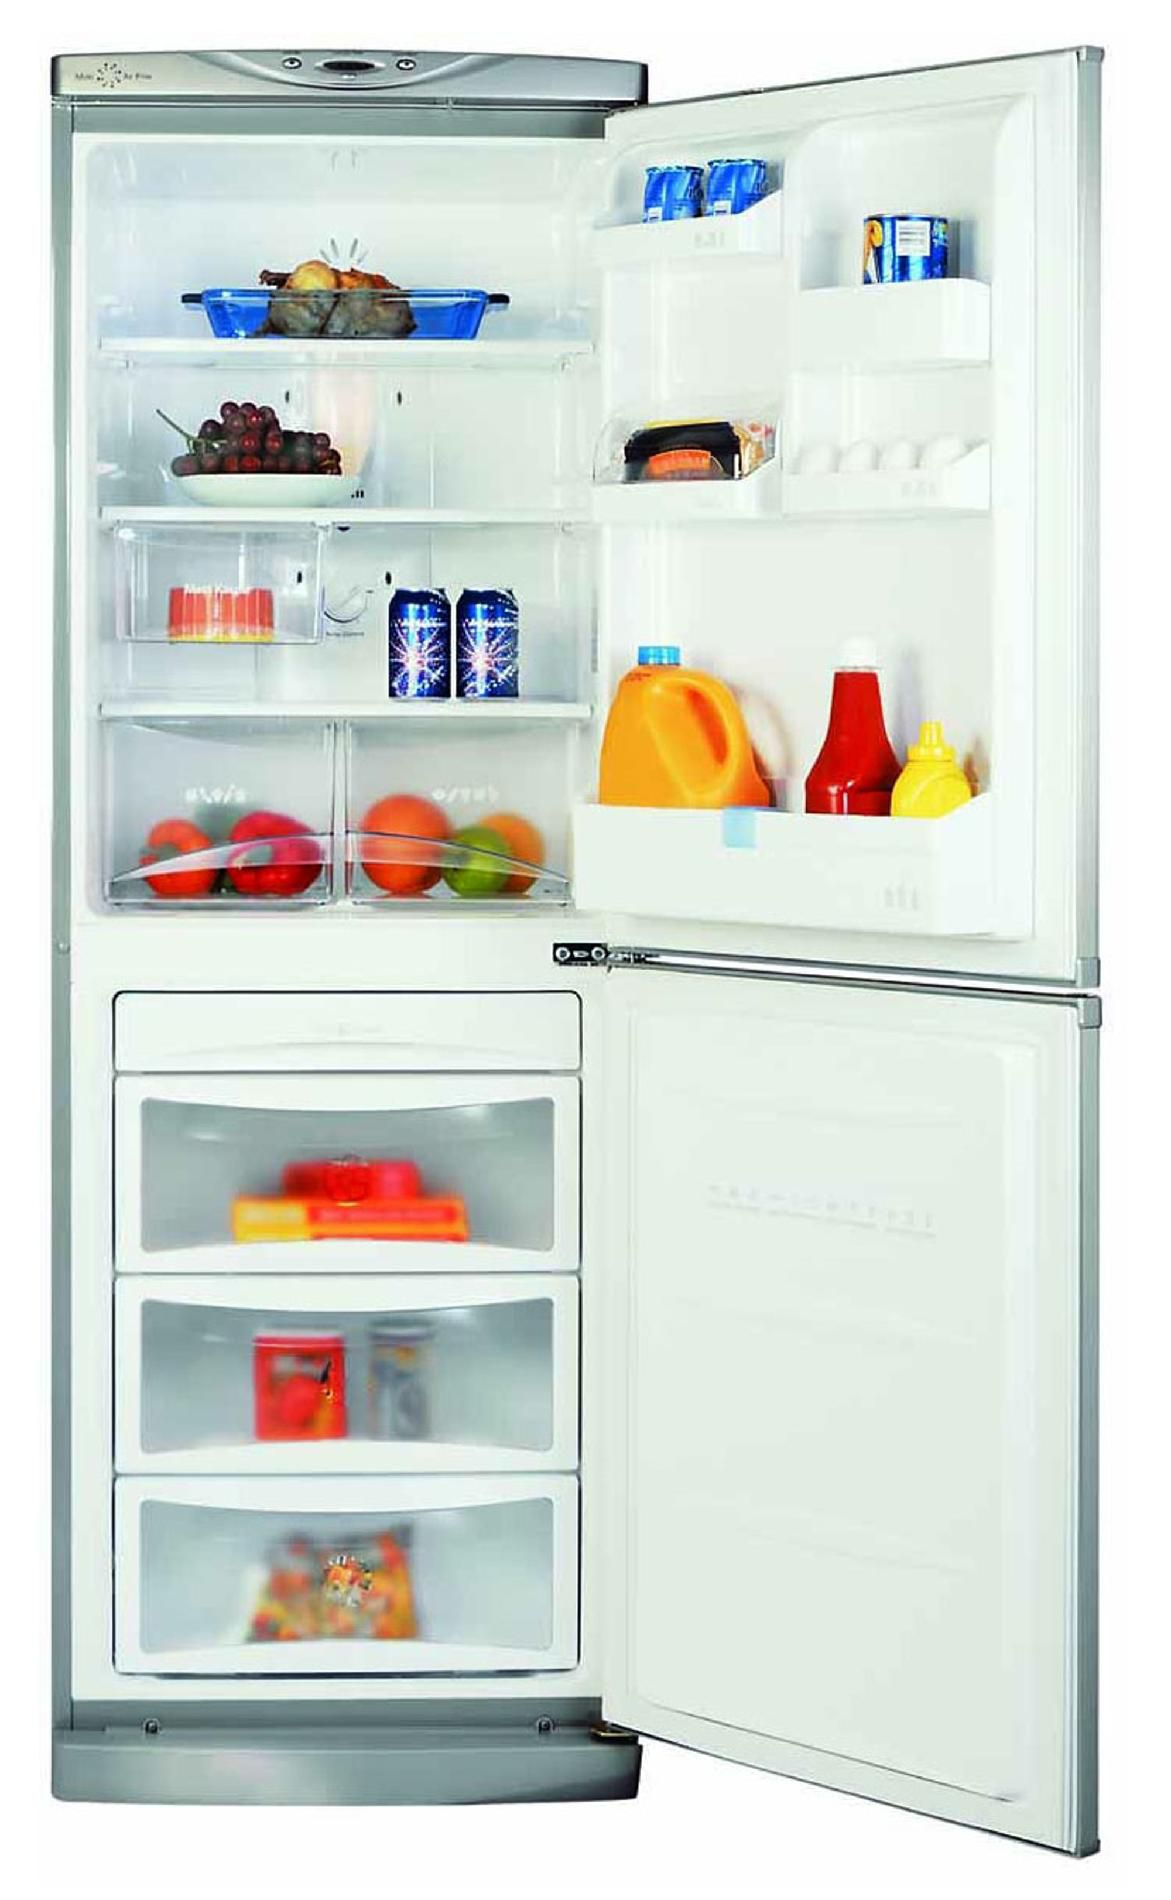 LG 10 cu. ft. Bottom-Freezer Refrigerator, White